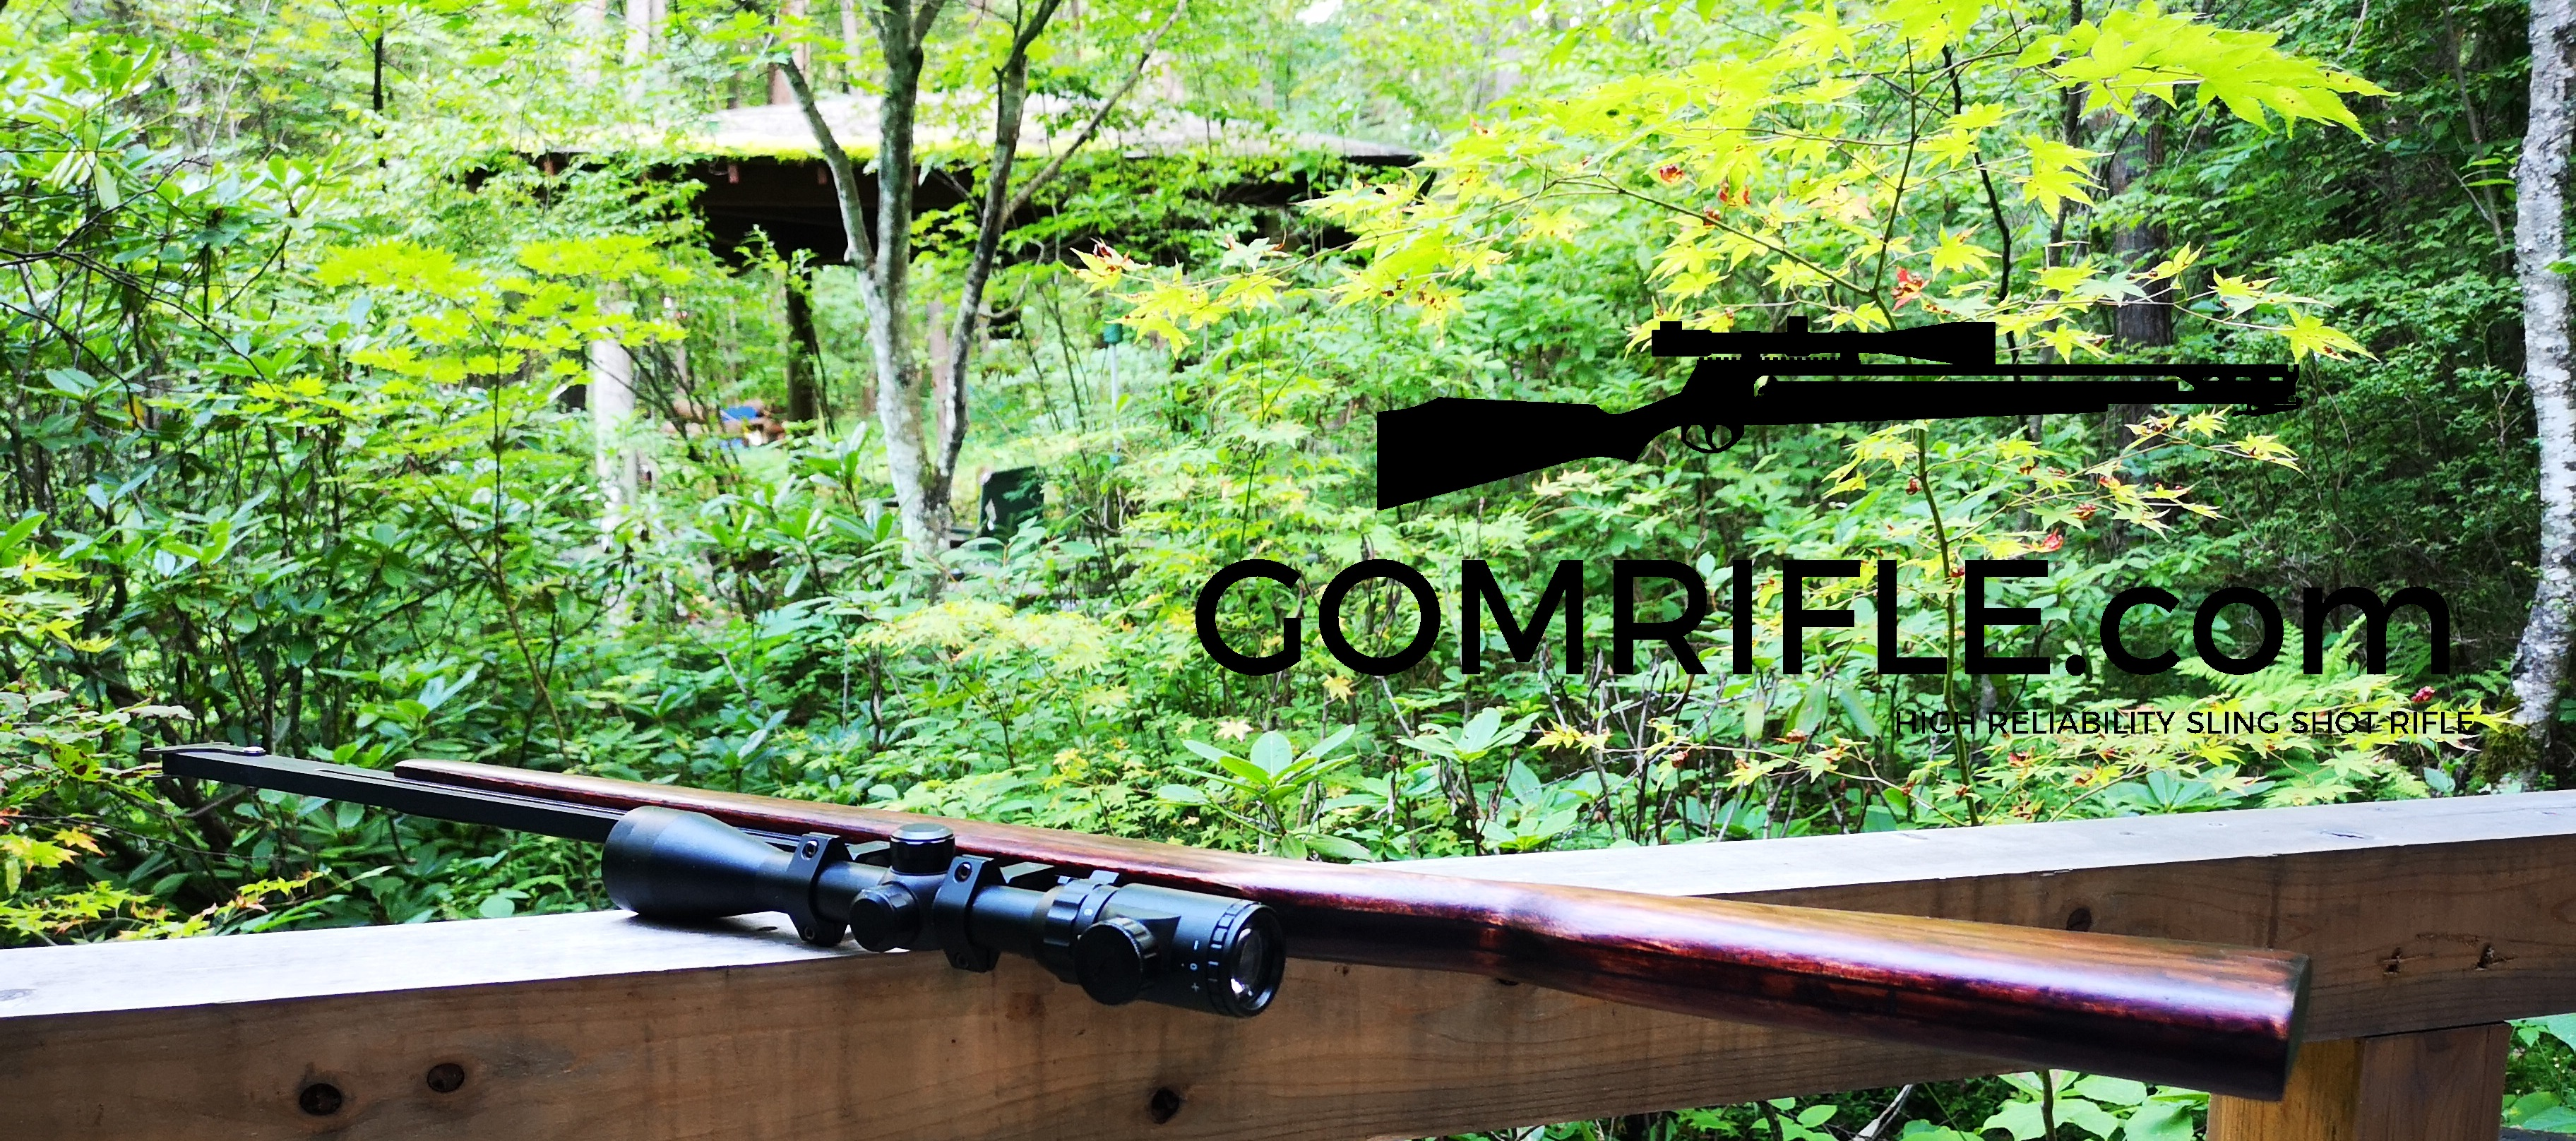 GOMRIFLE.com